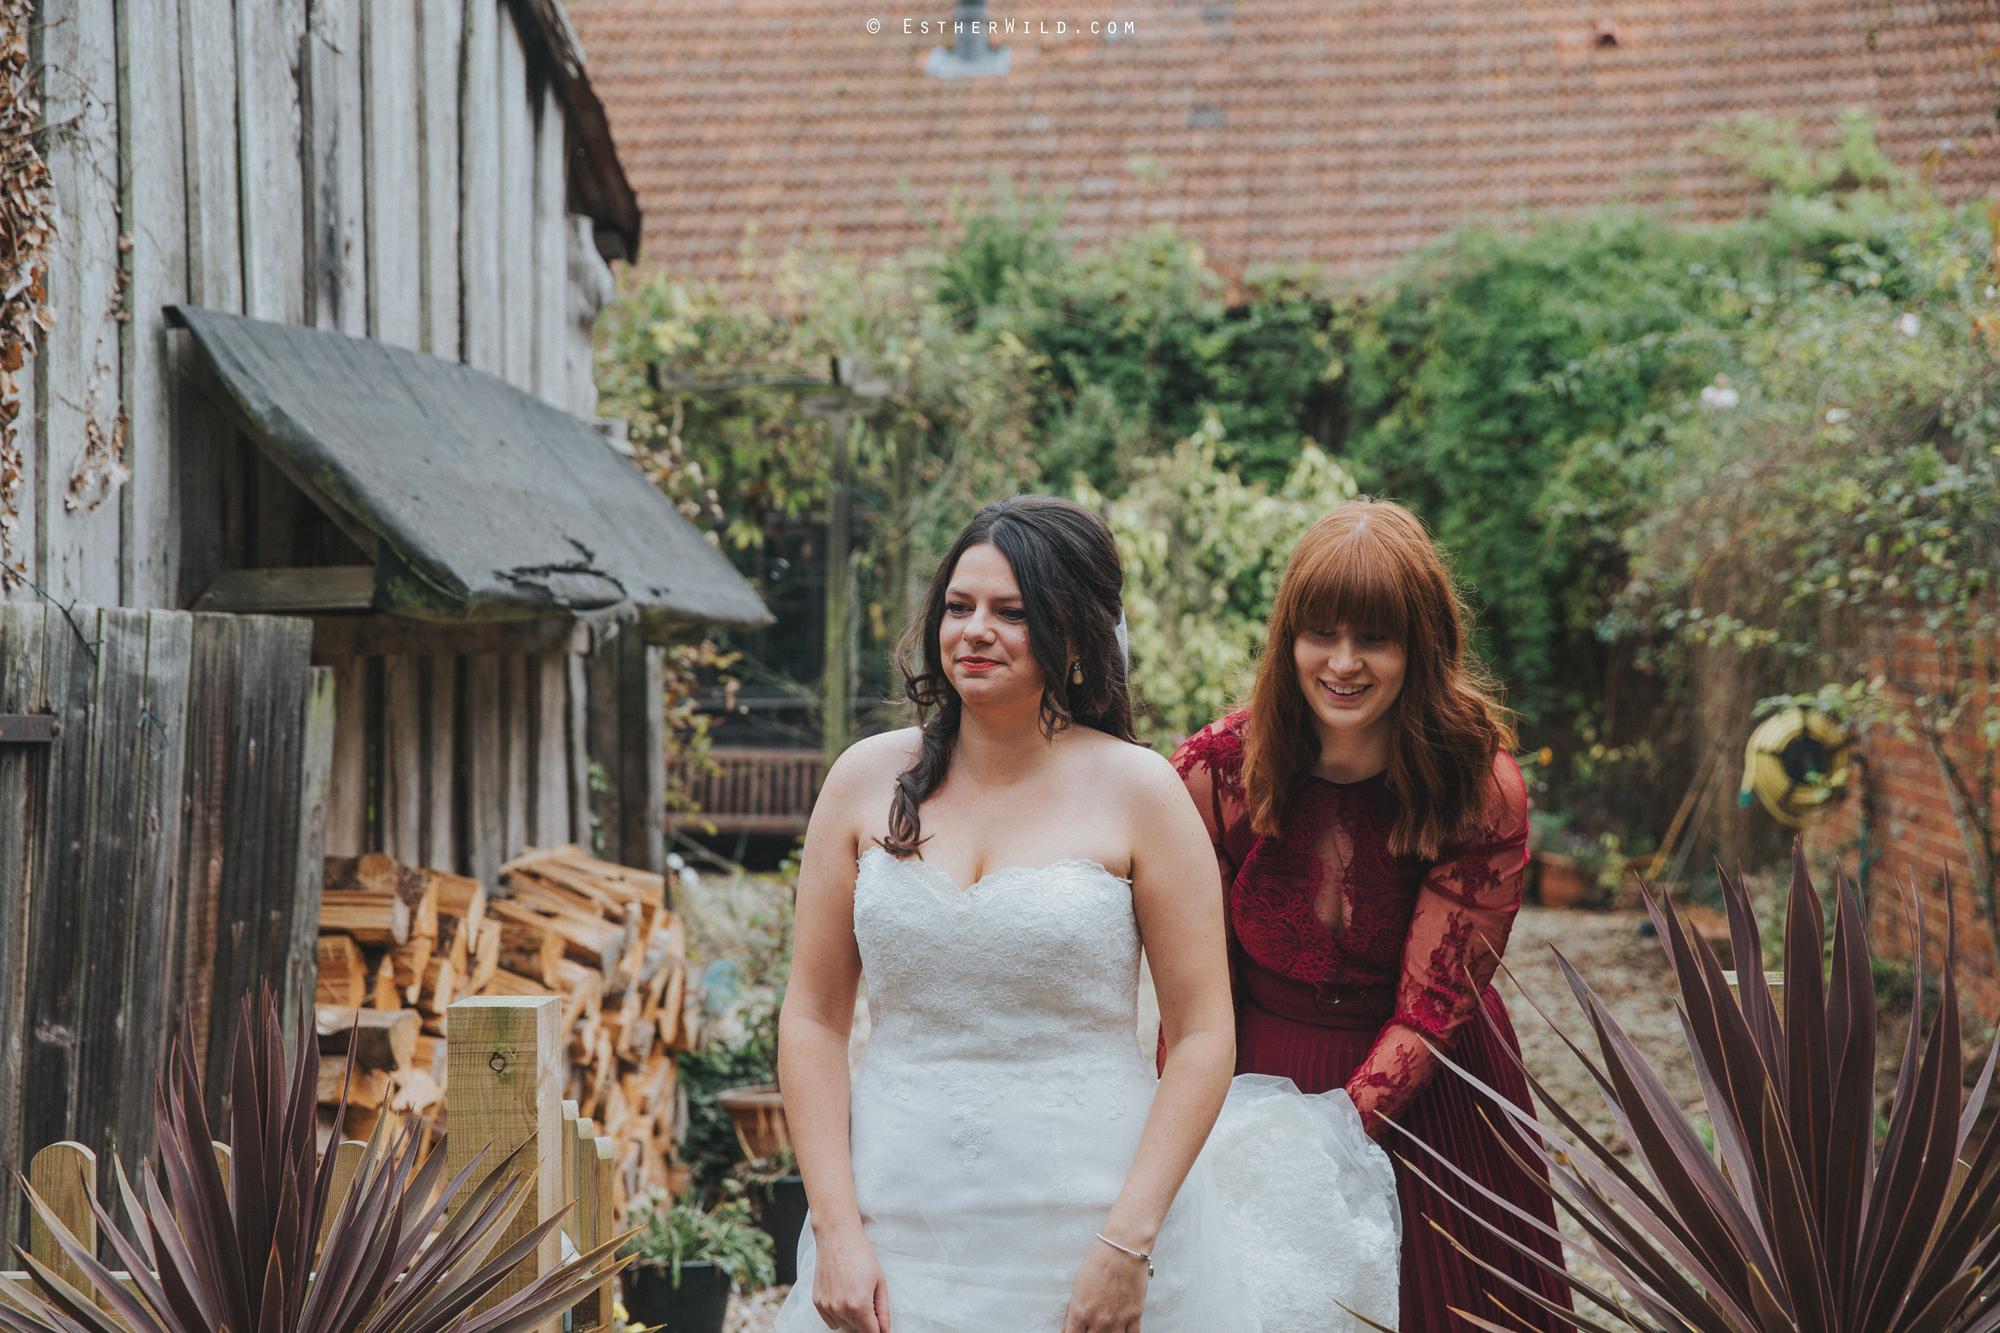 Reading_Room_Weddings_Alby_Norwich_Photographer_Esther_Wild_IMG_0637.jpg